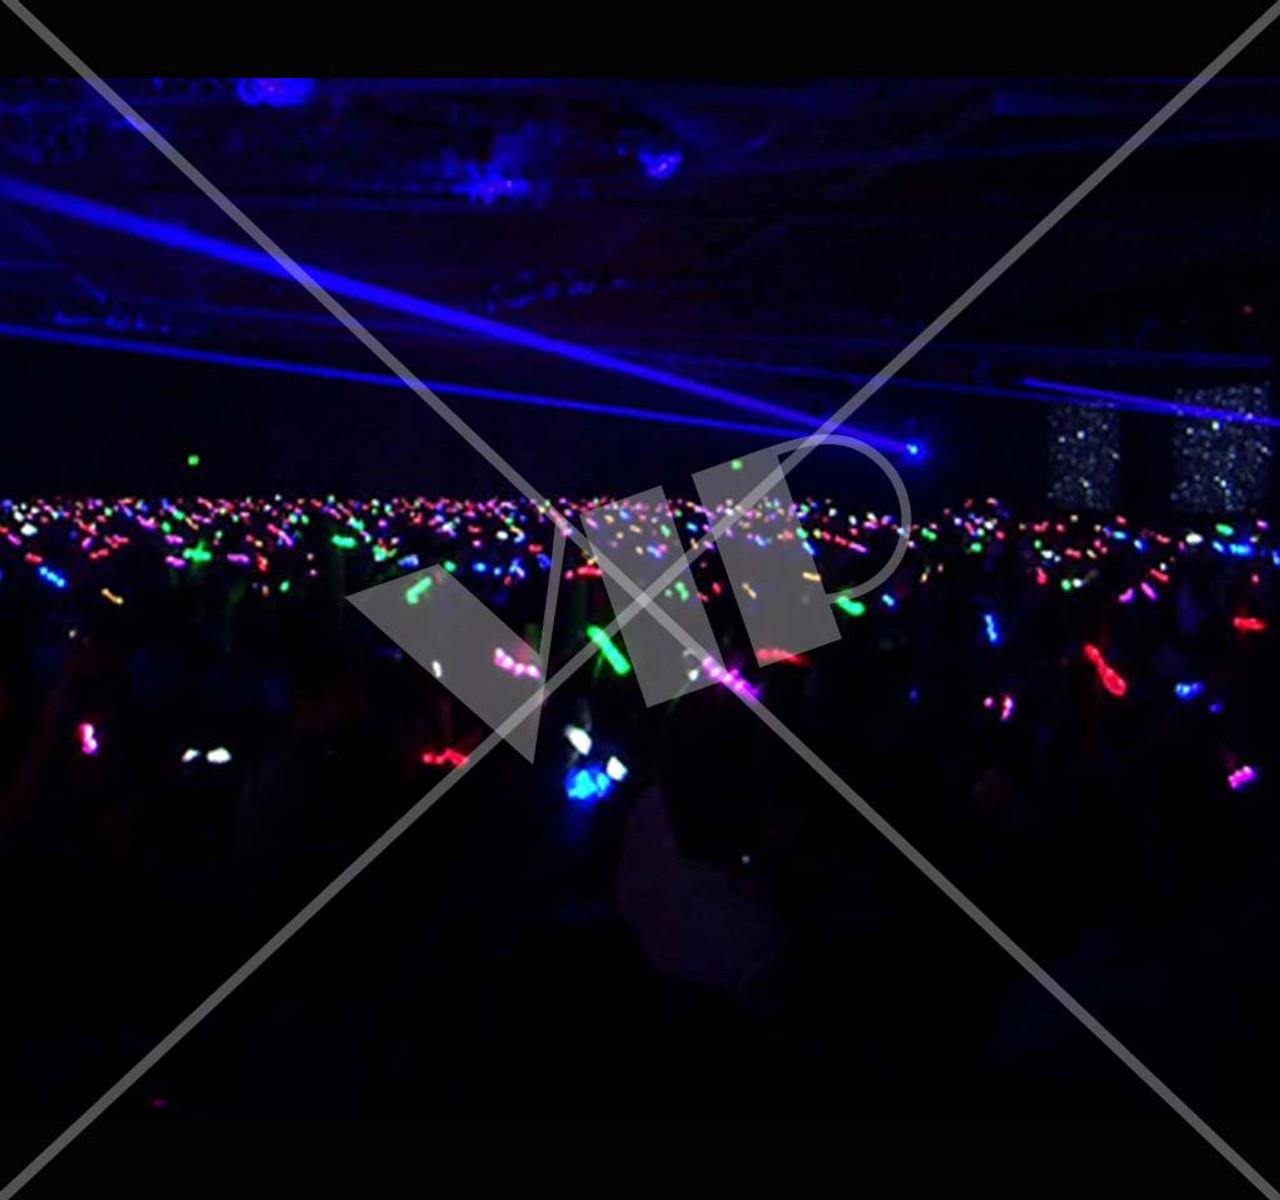 Sound,reactive,activated, custom, LED, Wristband,bracelet, sports,charity,school, nightclub, VIP, fundraiser, sound activated, music,flashing,LED wristband